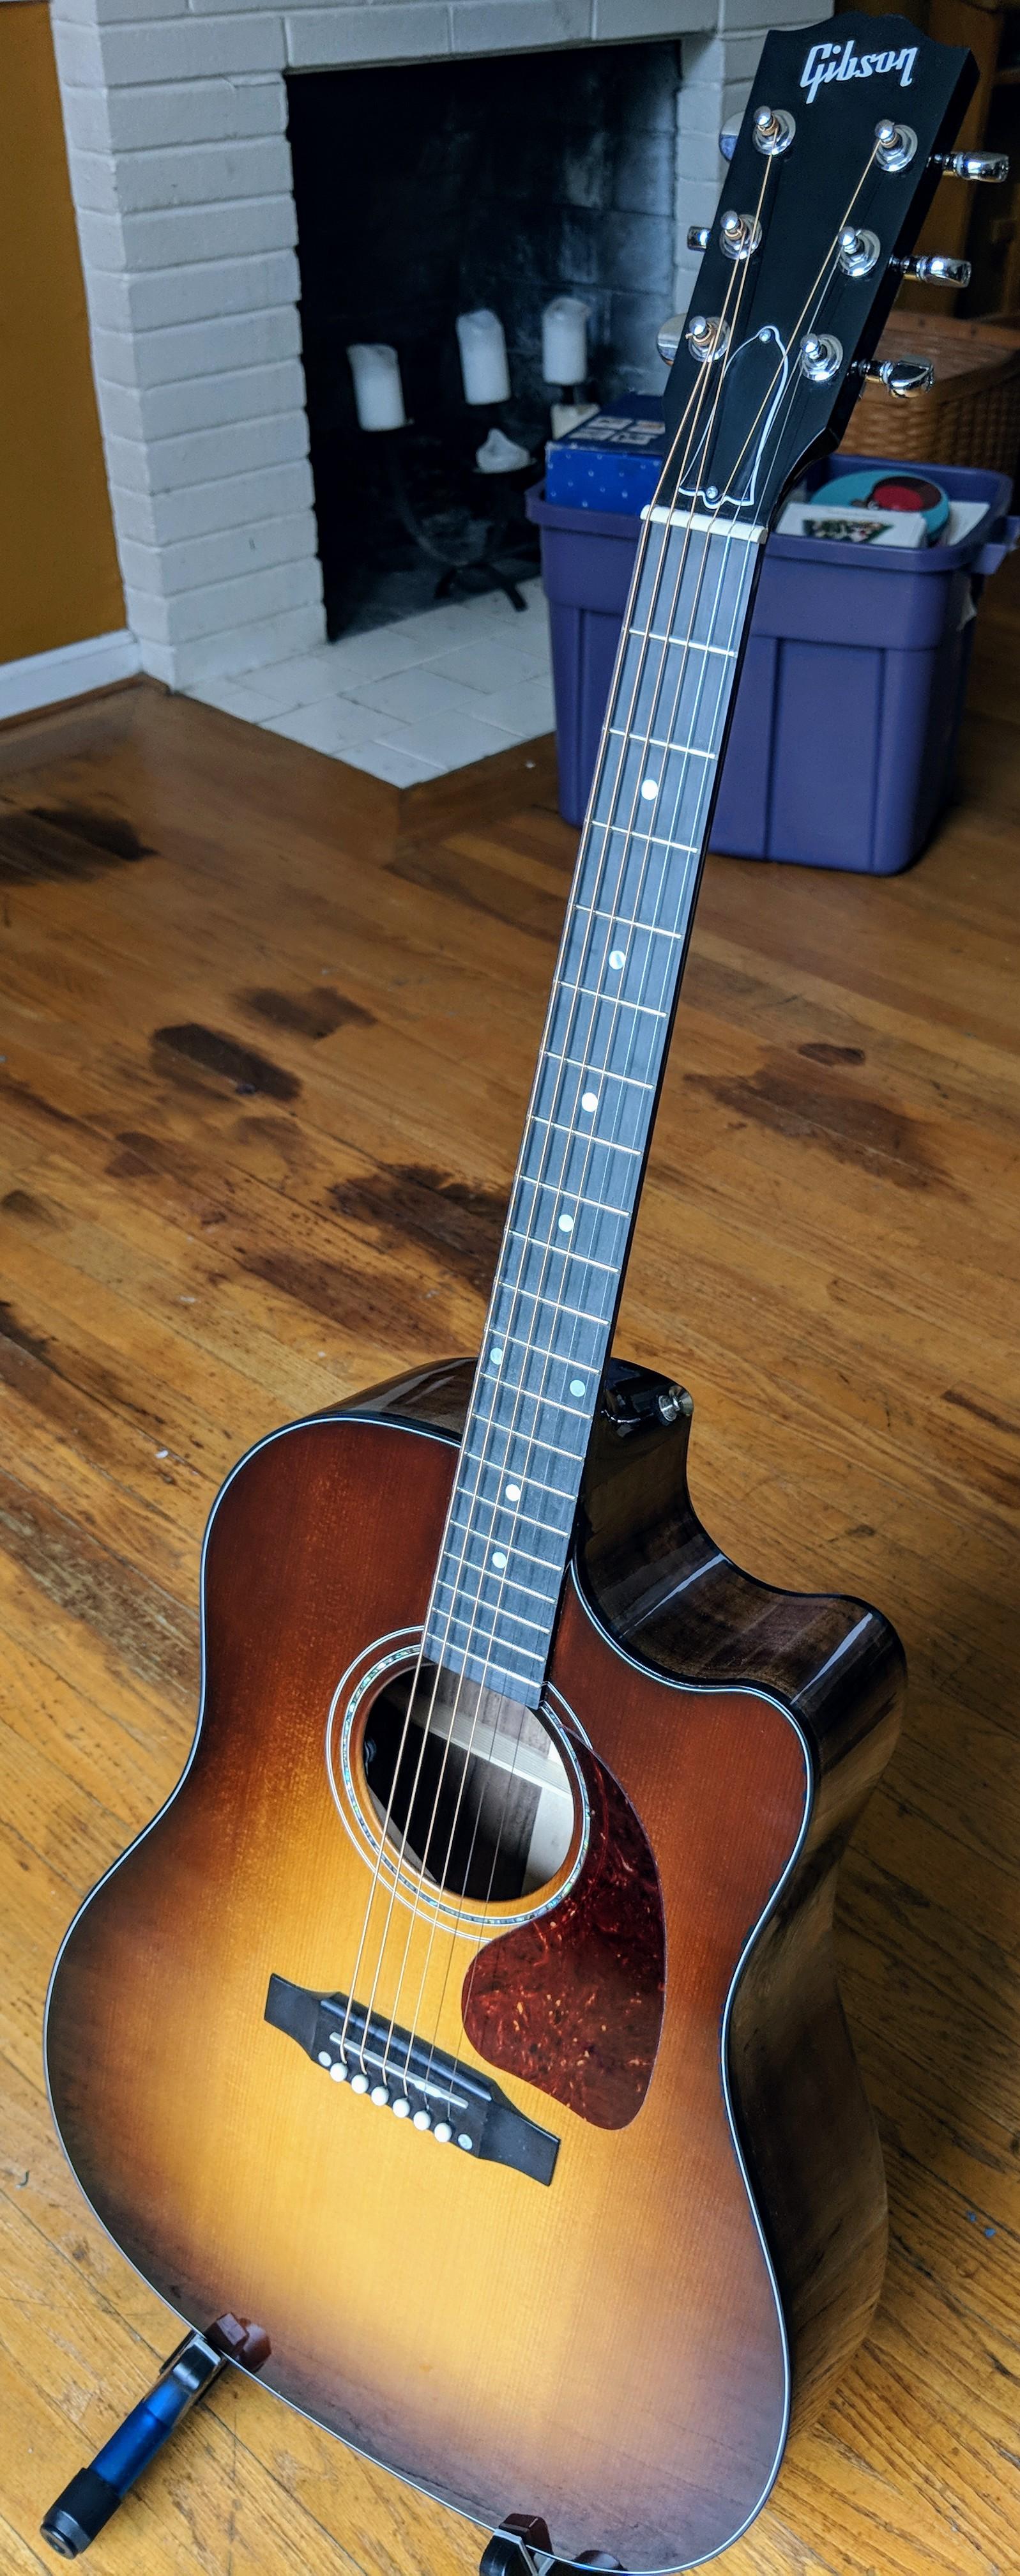 Gibson J-45 Studio Walnut Burst Bright Luster Musical Instruments & Gear Guitars & Basses